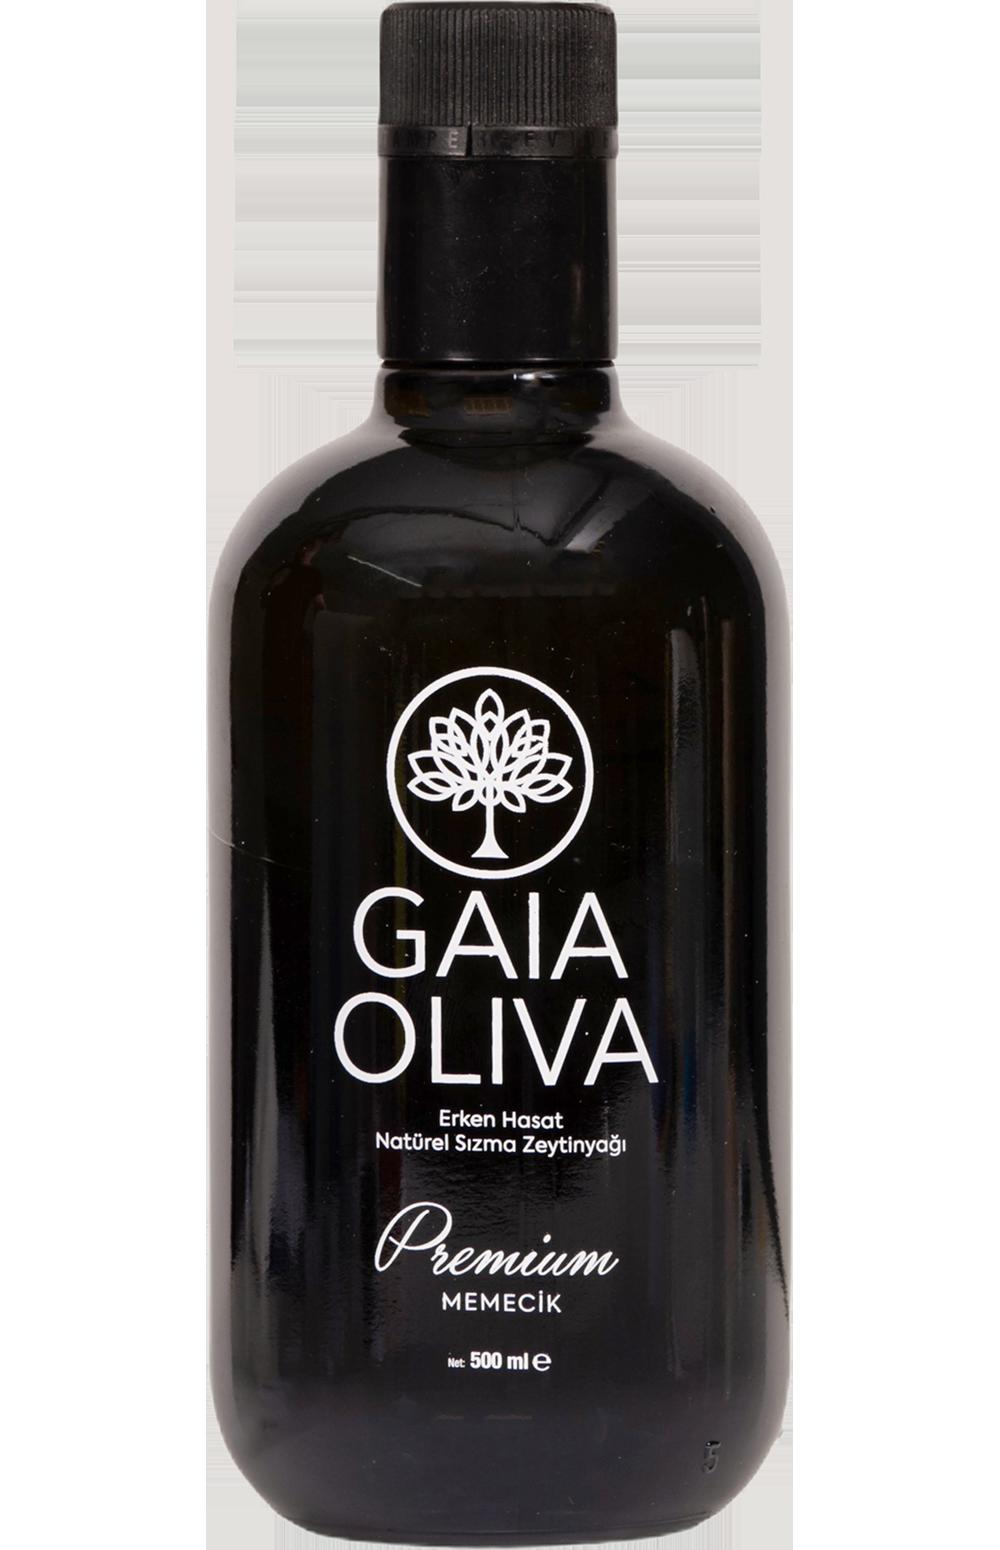 Gaia Oliva- Memecik